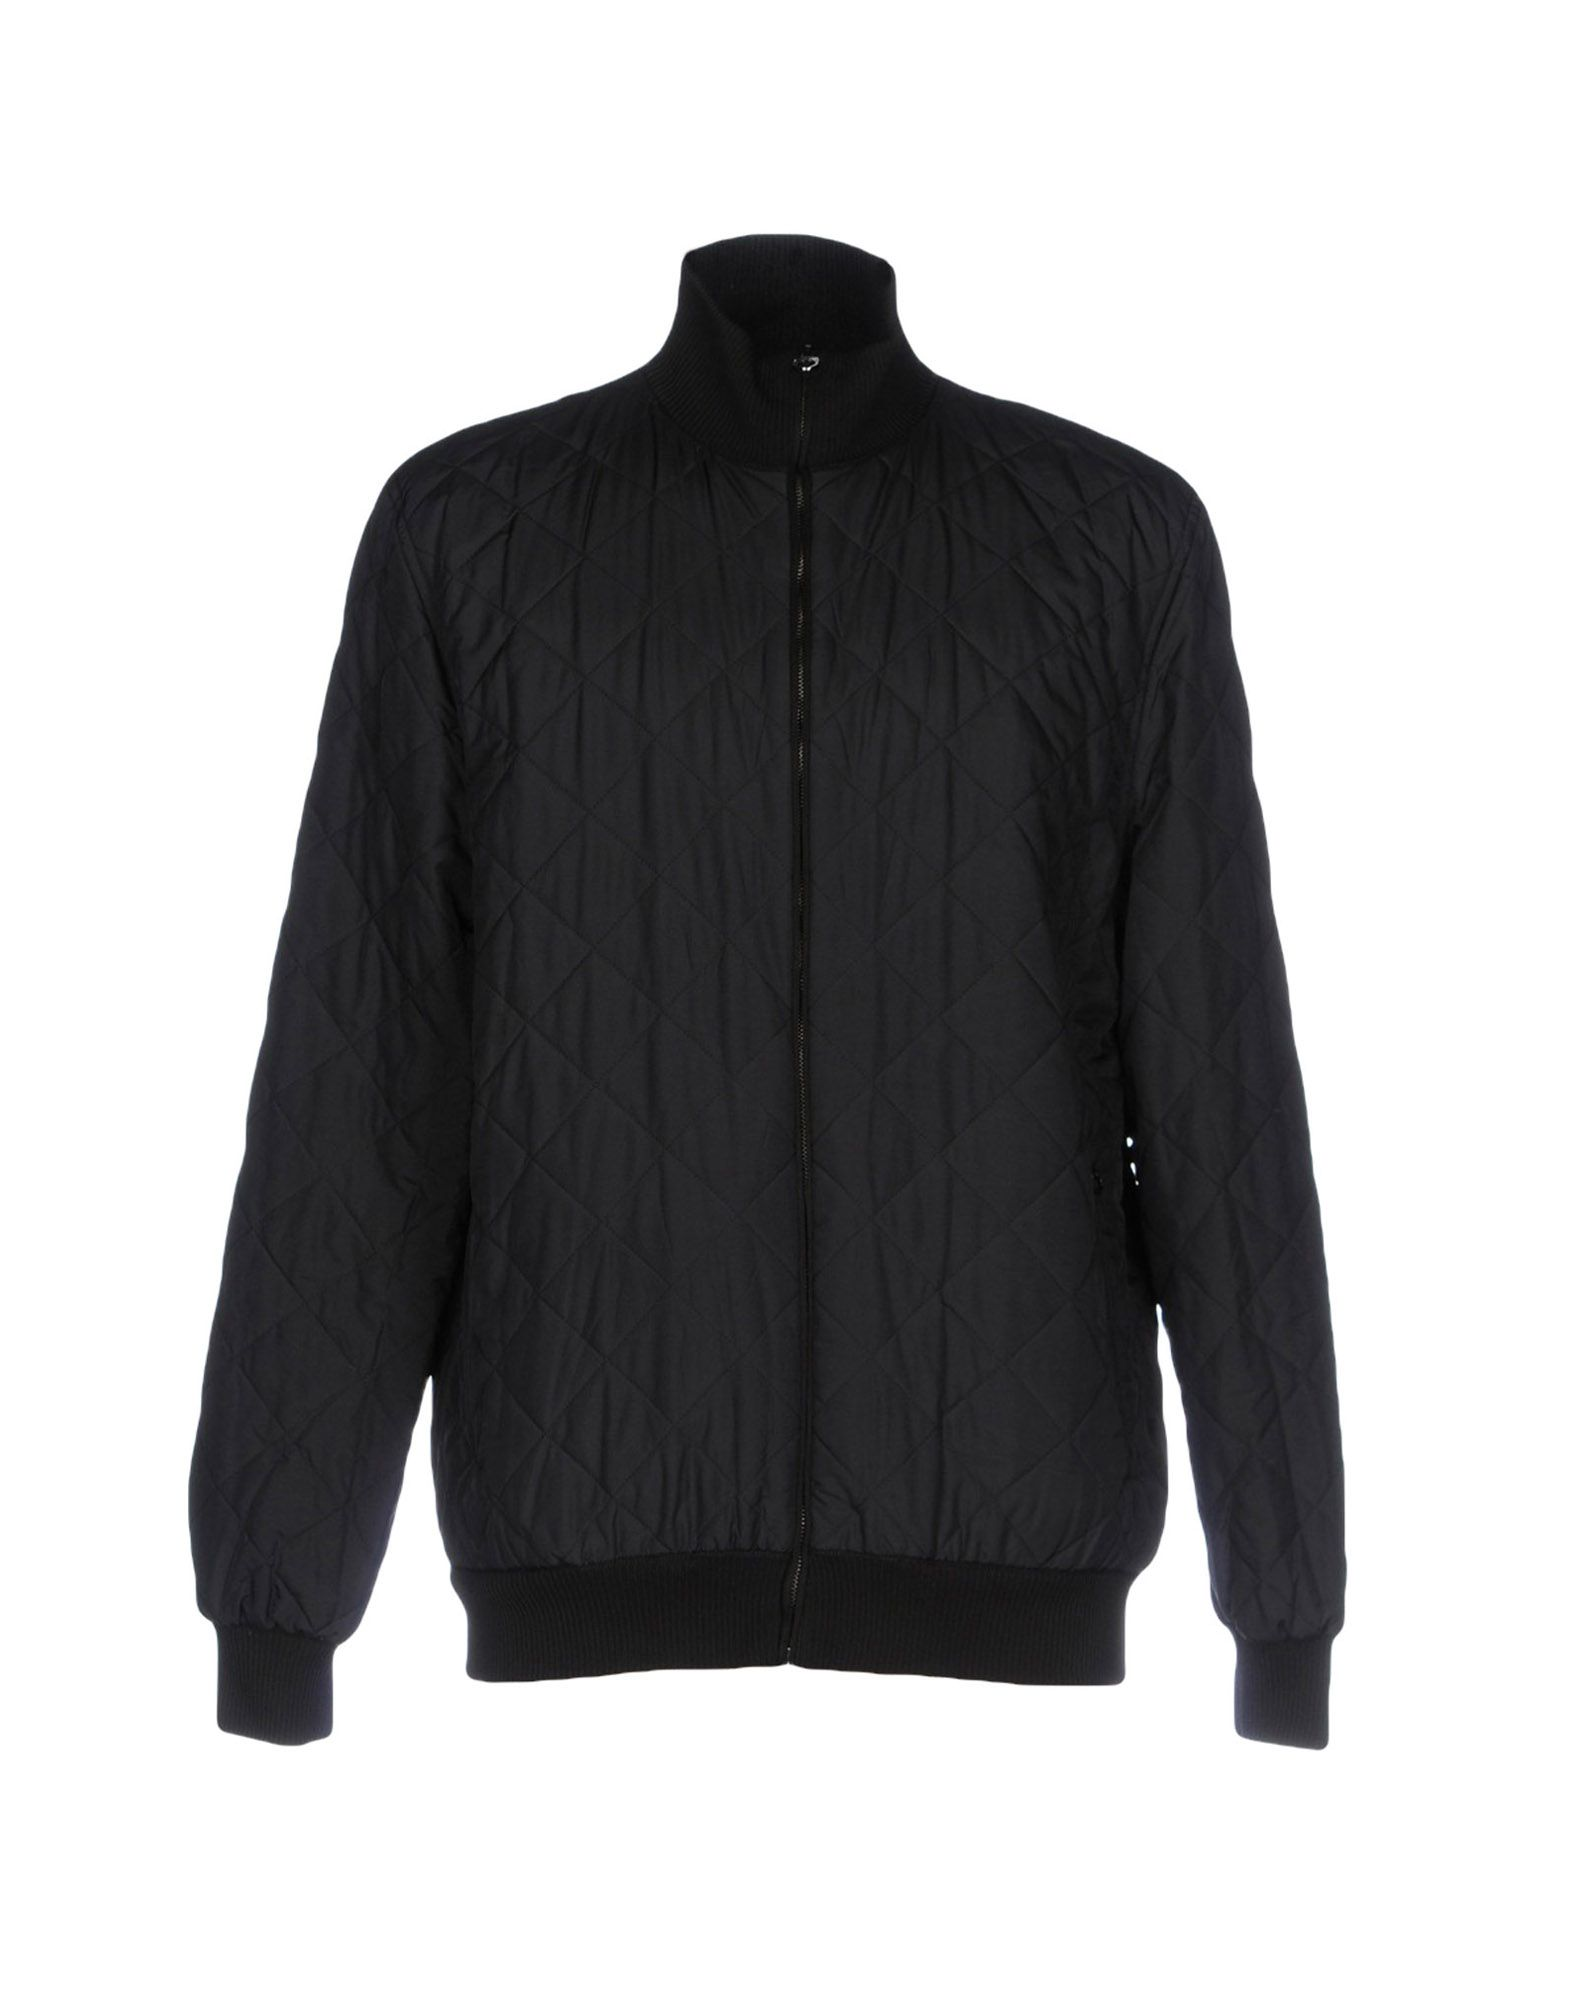 SALVATORE FERRAGAMO Куртка platinor platinor 50200 221